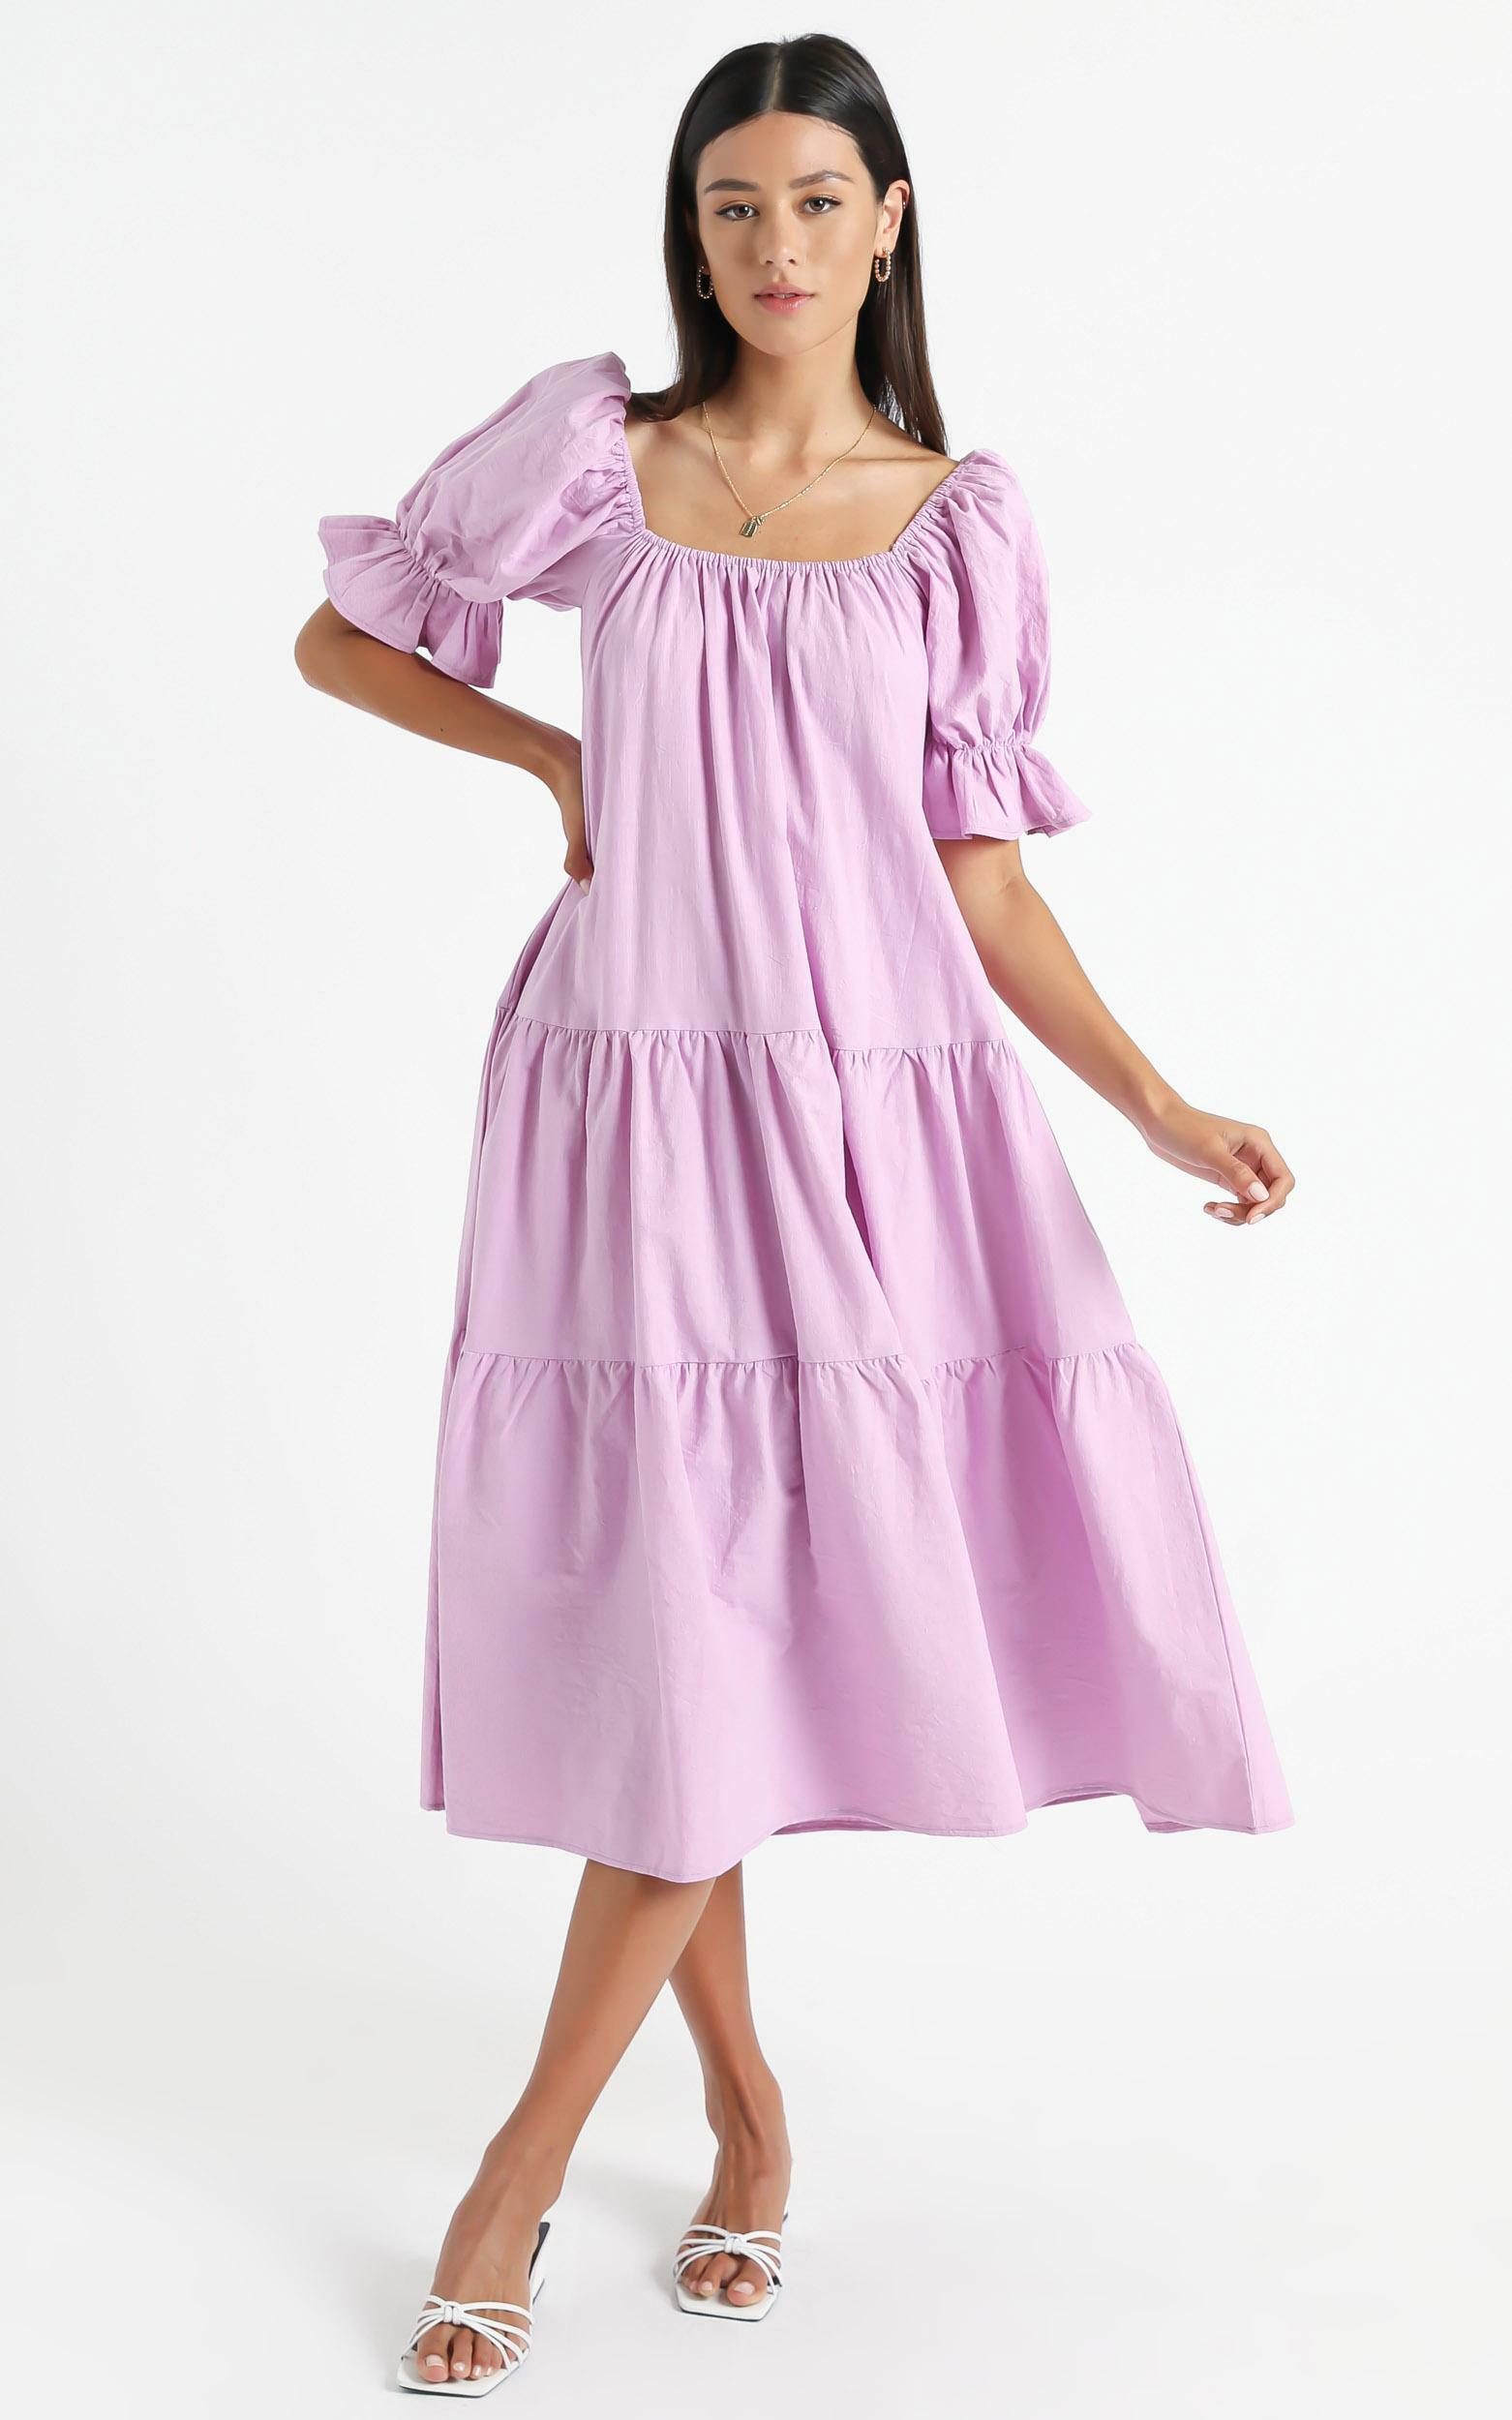 Zaharrah Dress in Lilac Linen Look - 6 (XS), PRP3, hi-res image number null